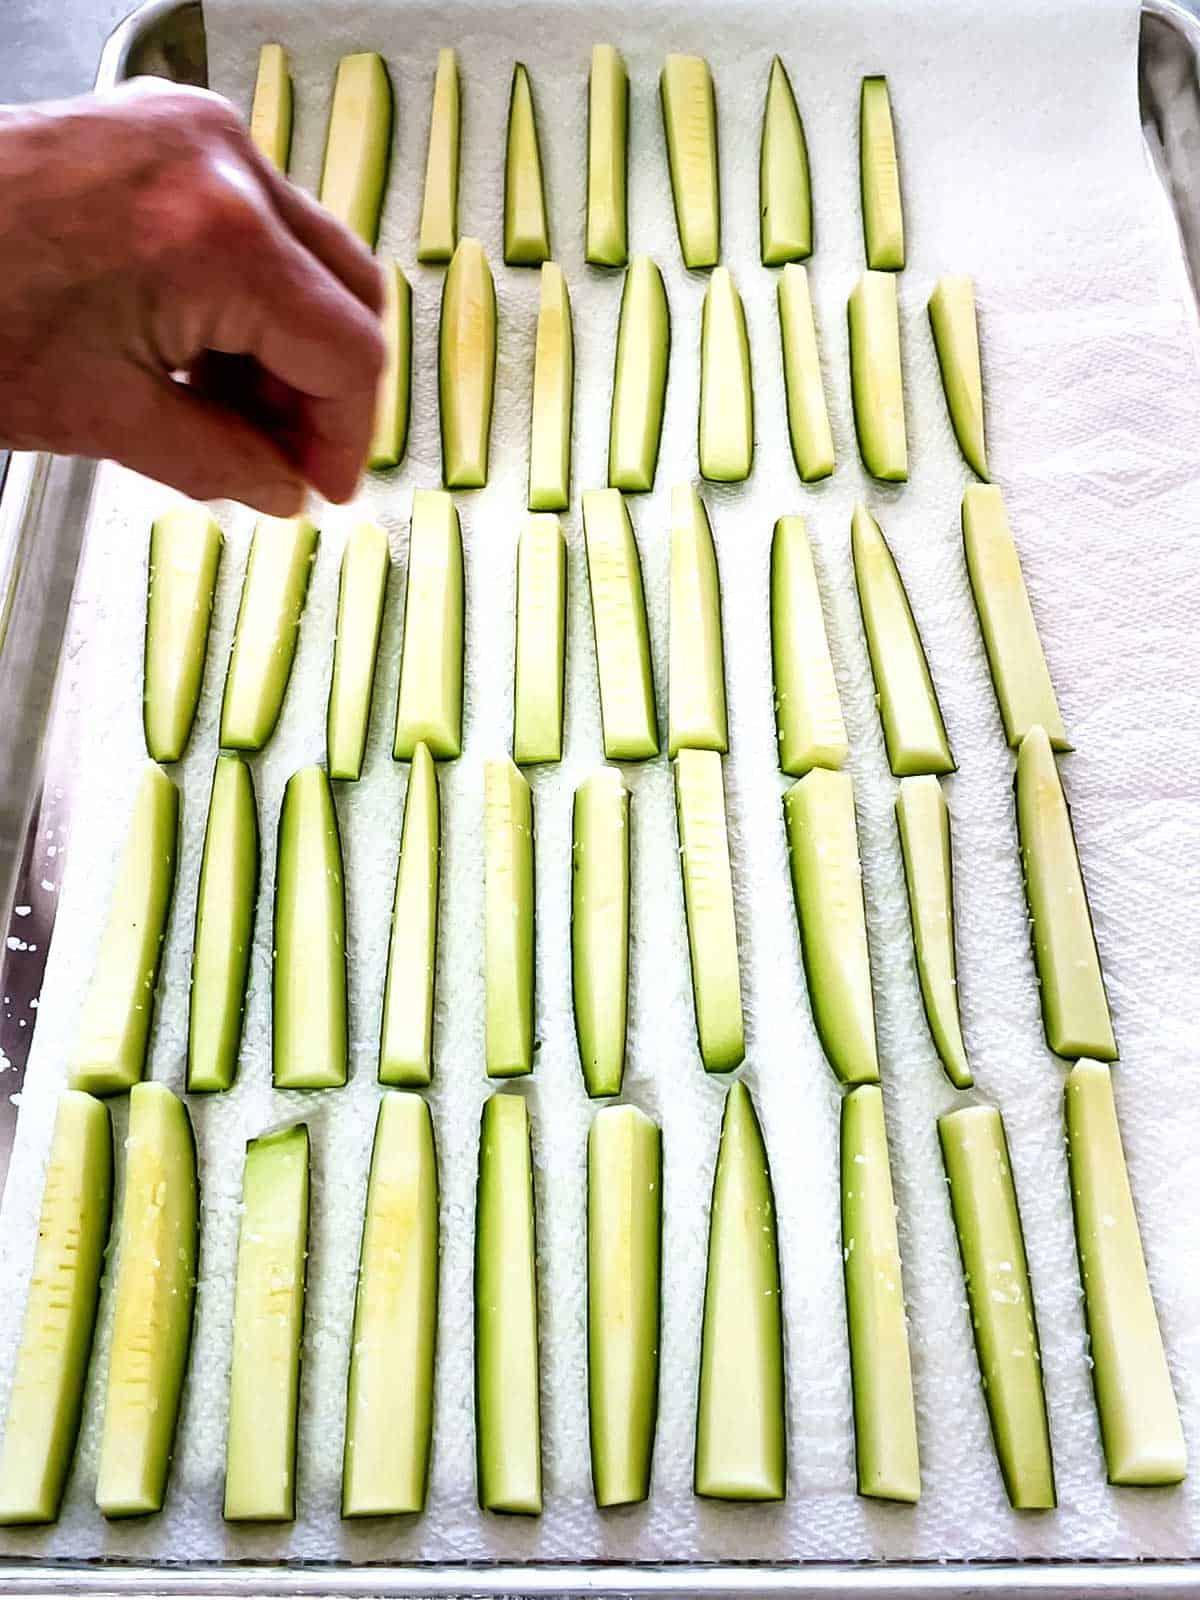 Sprinkling salt on zucchini sticks